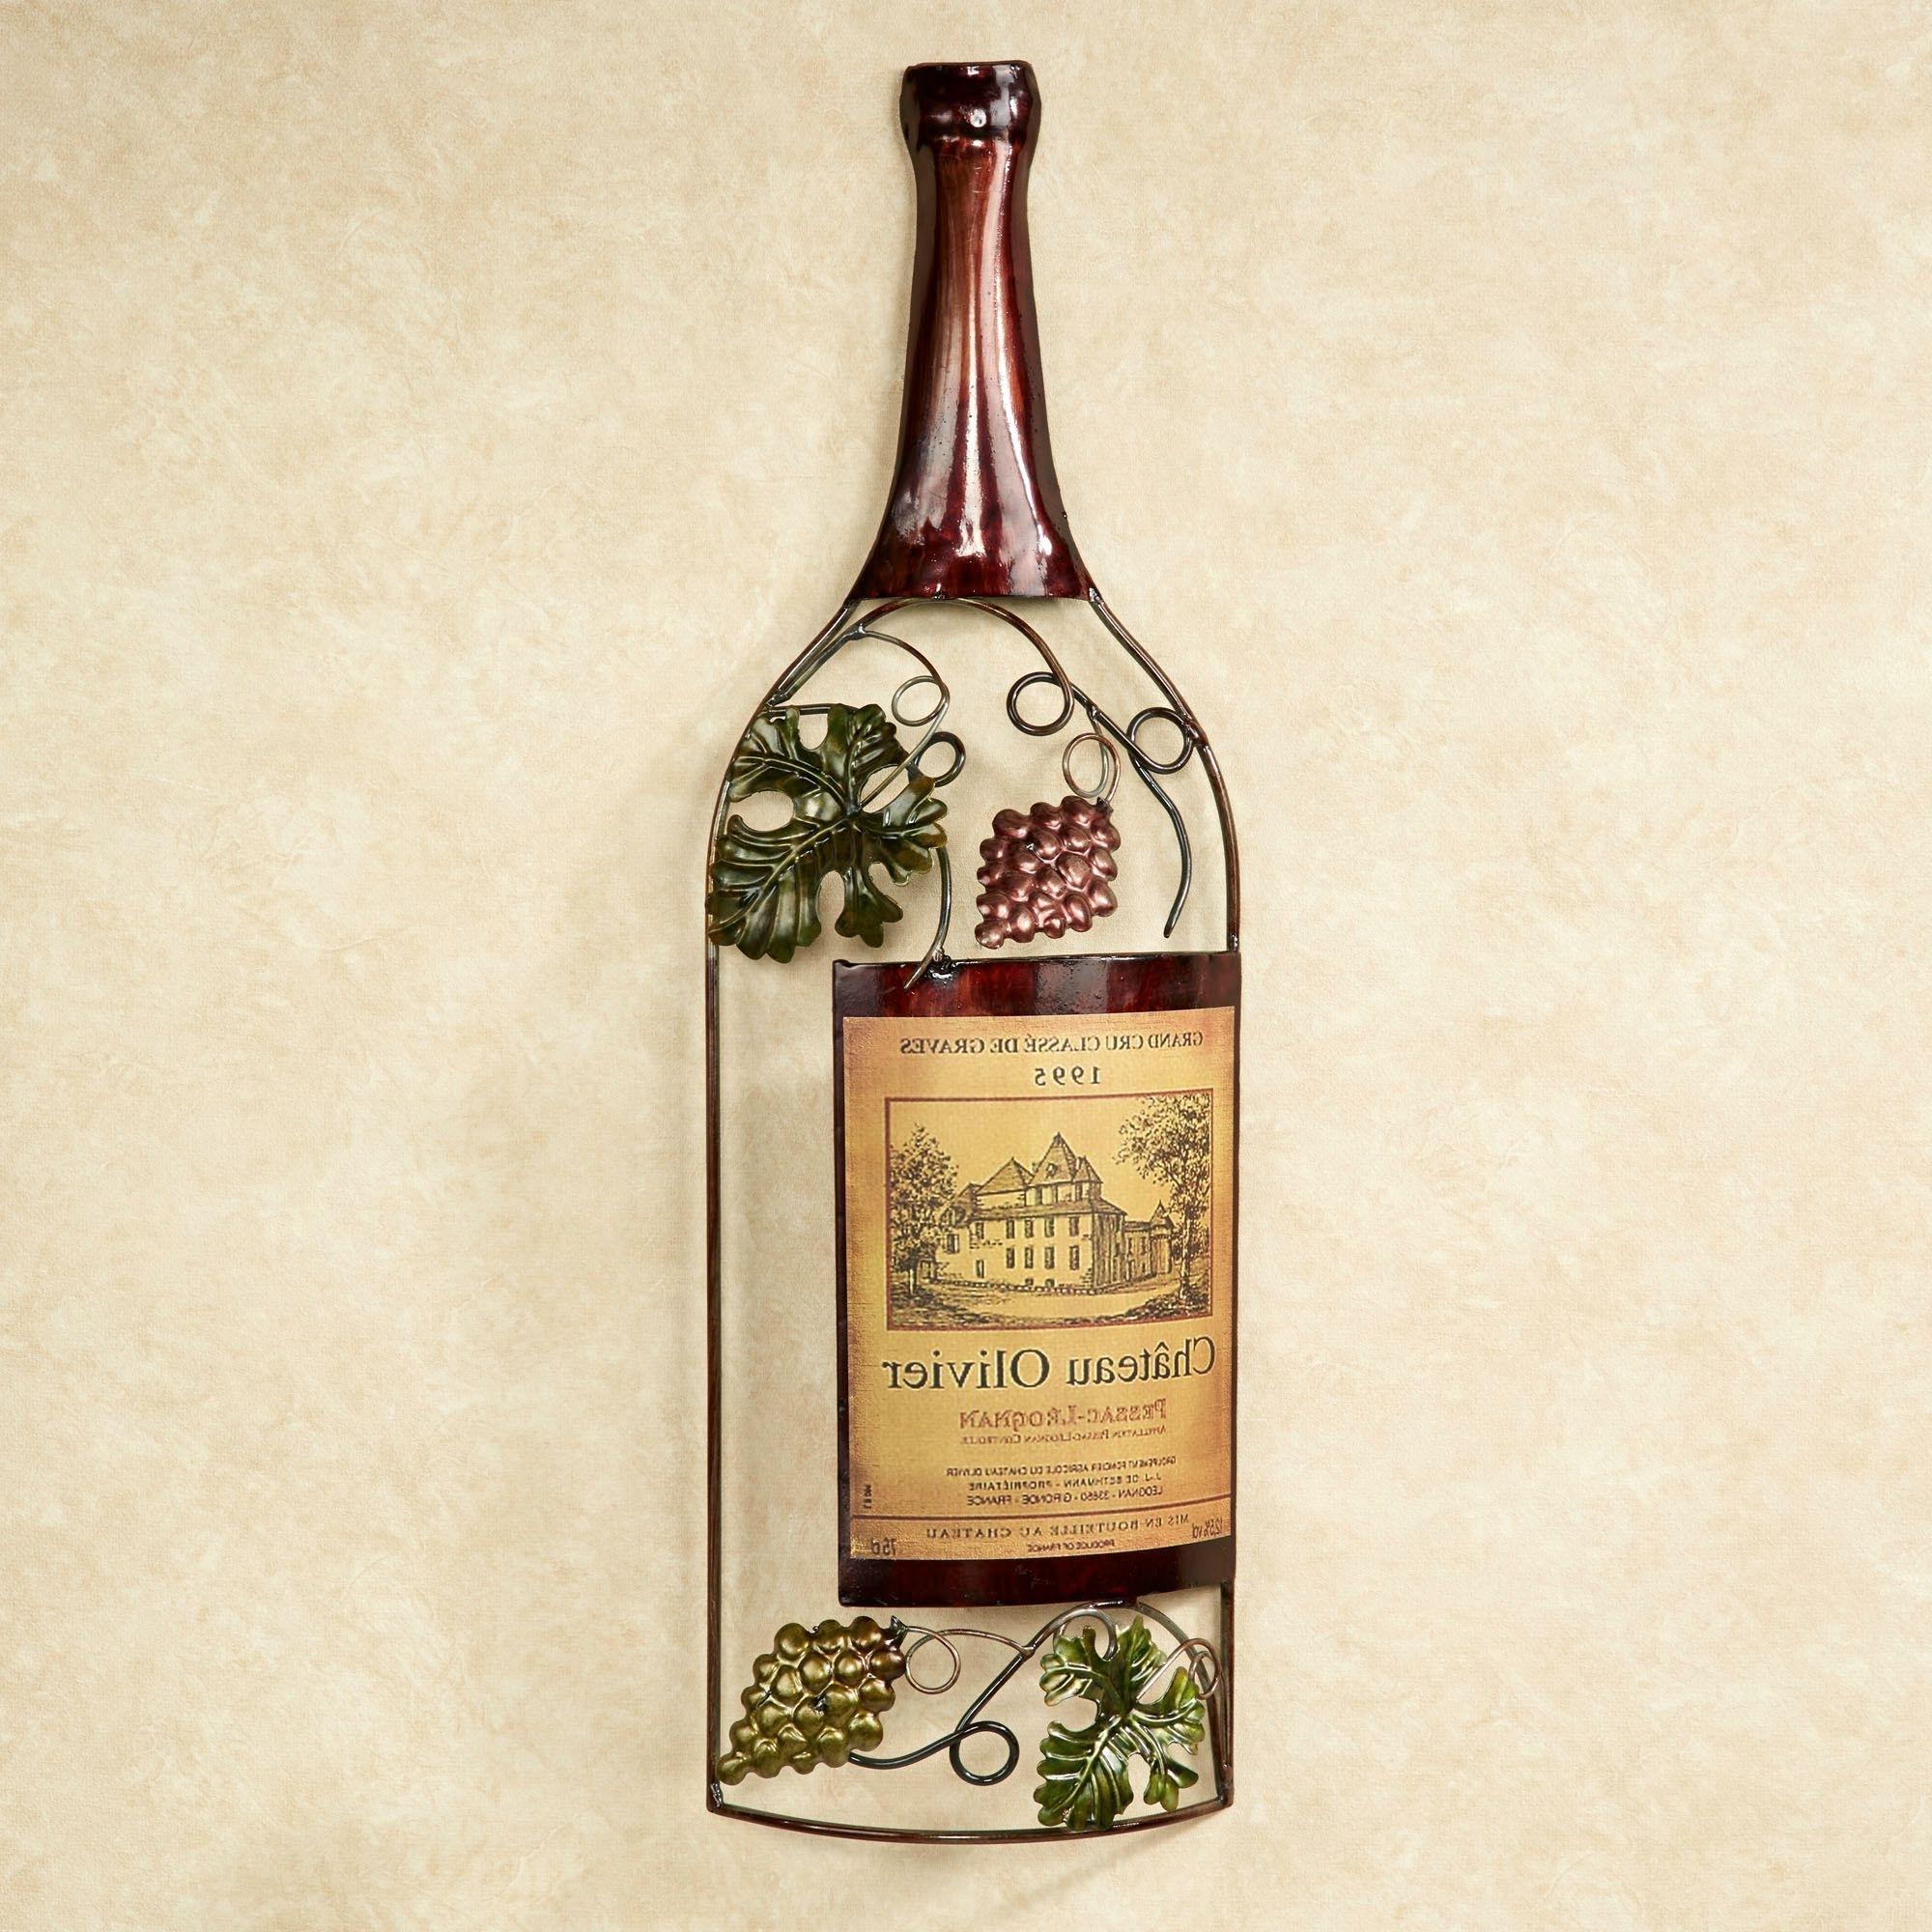 Widely Used Wall Art Design Ideas: Vineyards Metal Wine Bottle Wall Art Sample In Wine Metal Wall Art (View 5 of 15)